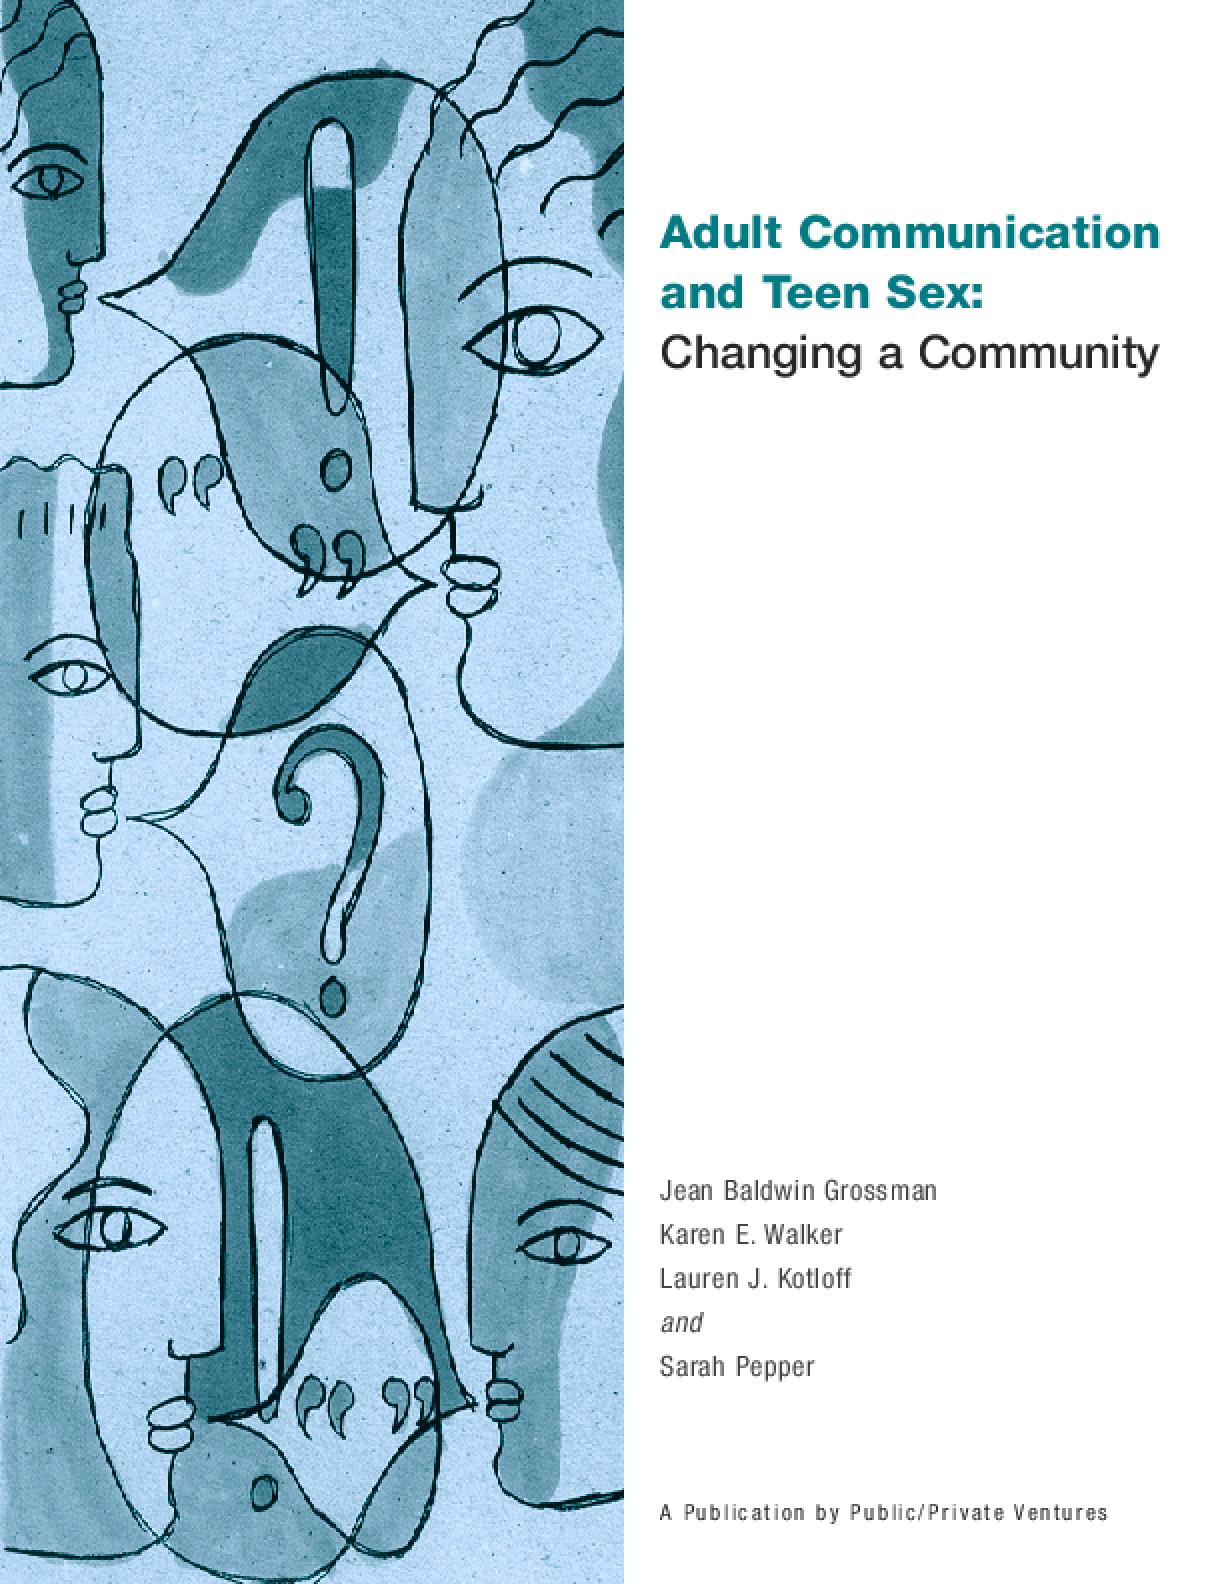 Adult Communication 29